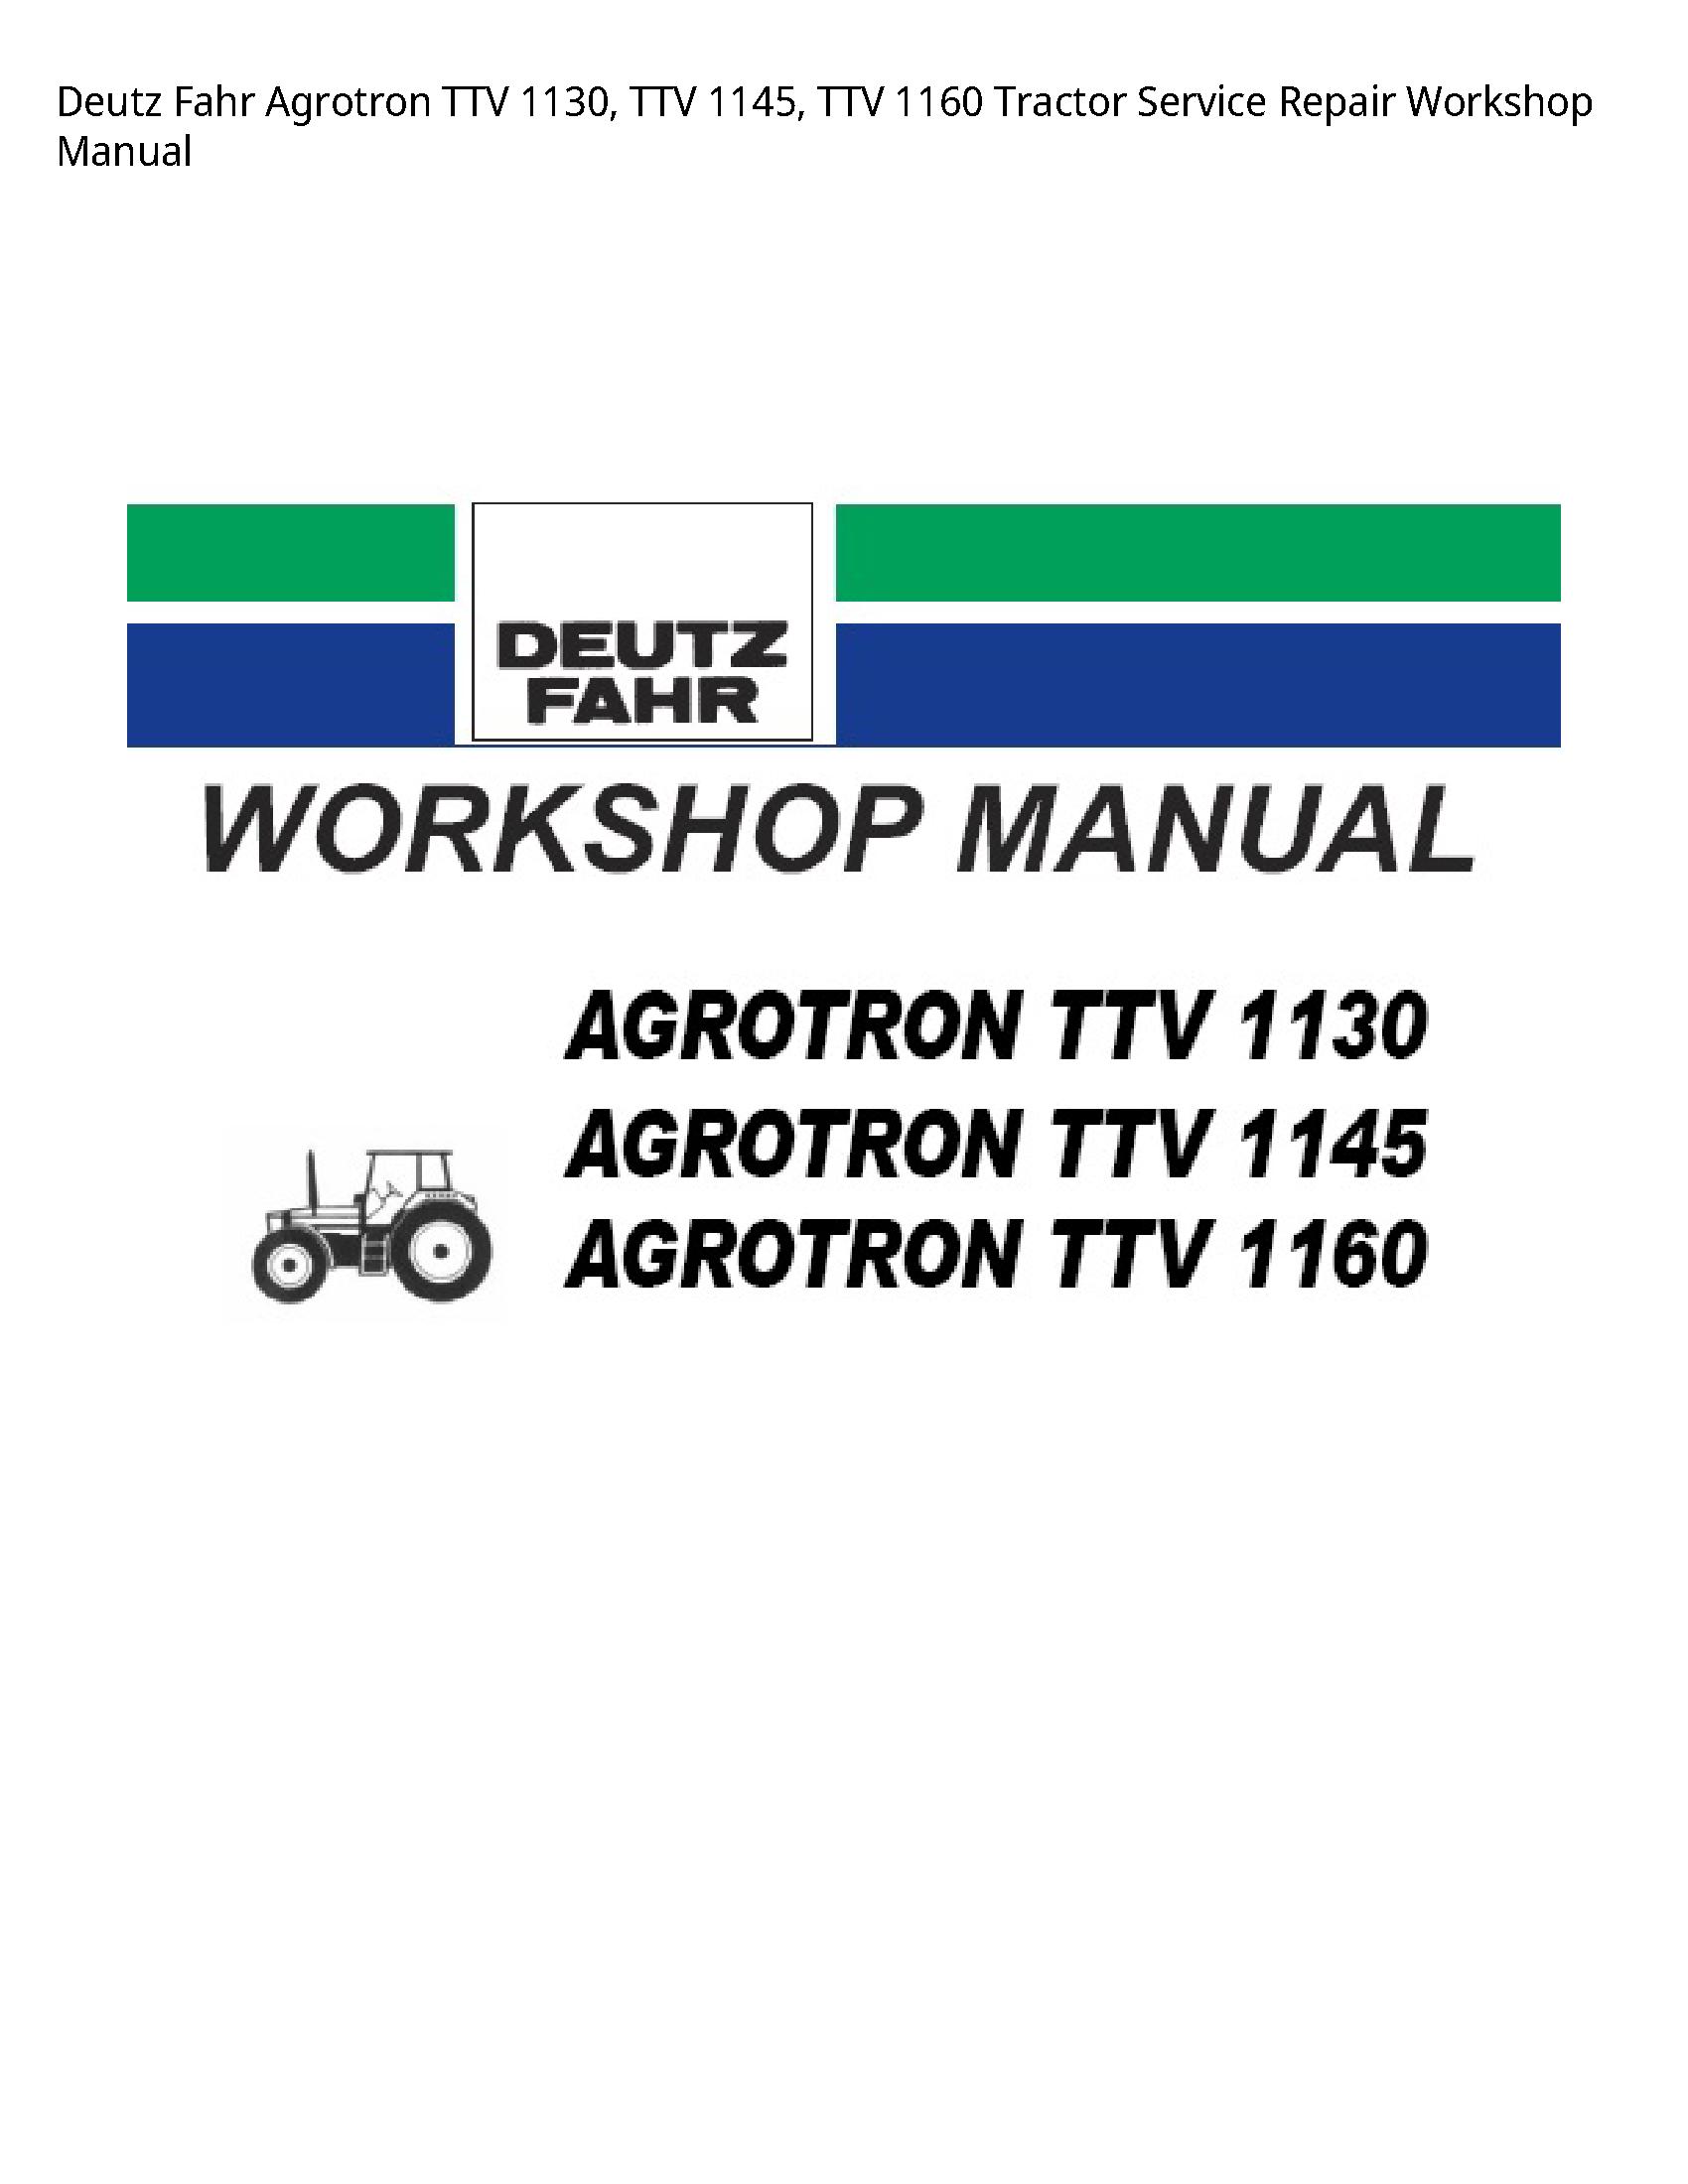 Deutz 1130 Fahr Agrotron TTV TTV TTV Tractor manual